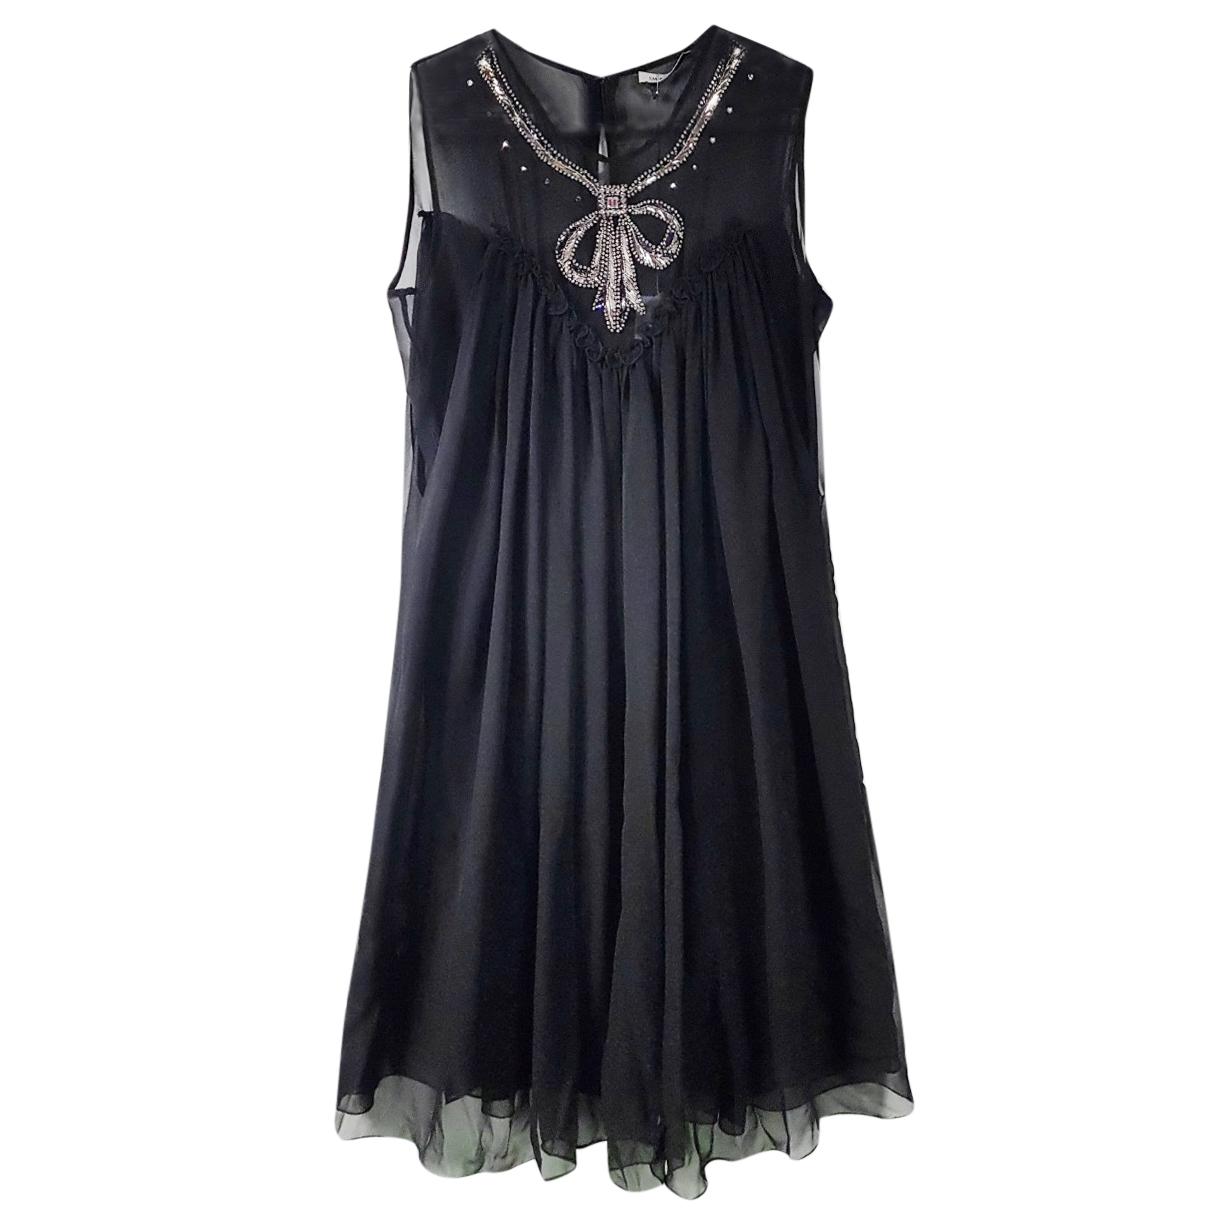 Emma Cook Embellished Chiffon Evening Dress